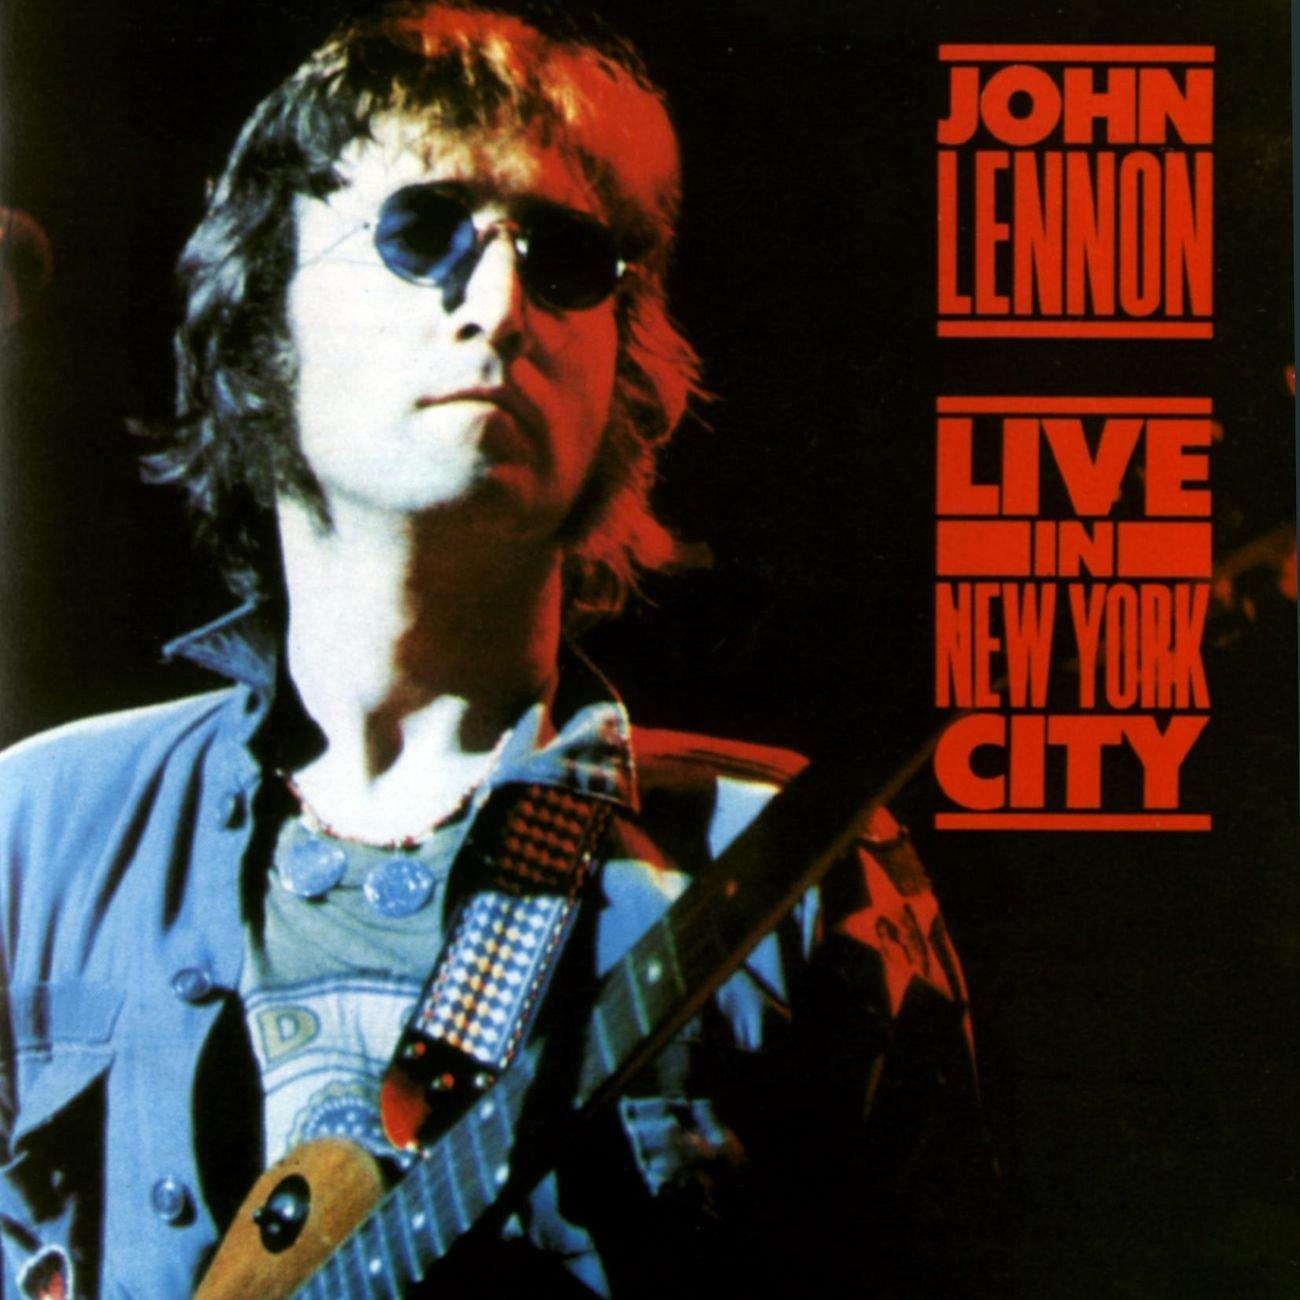 John Lennon - Live In New York City ( LP semi novo. Acompanha encarte )